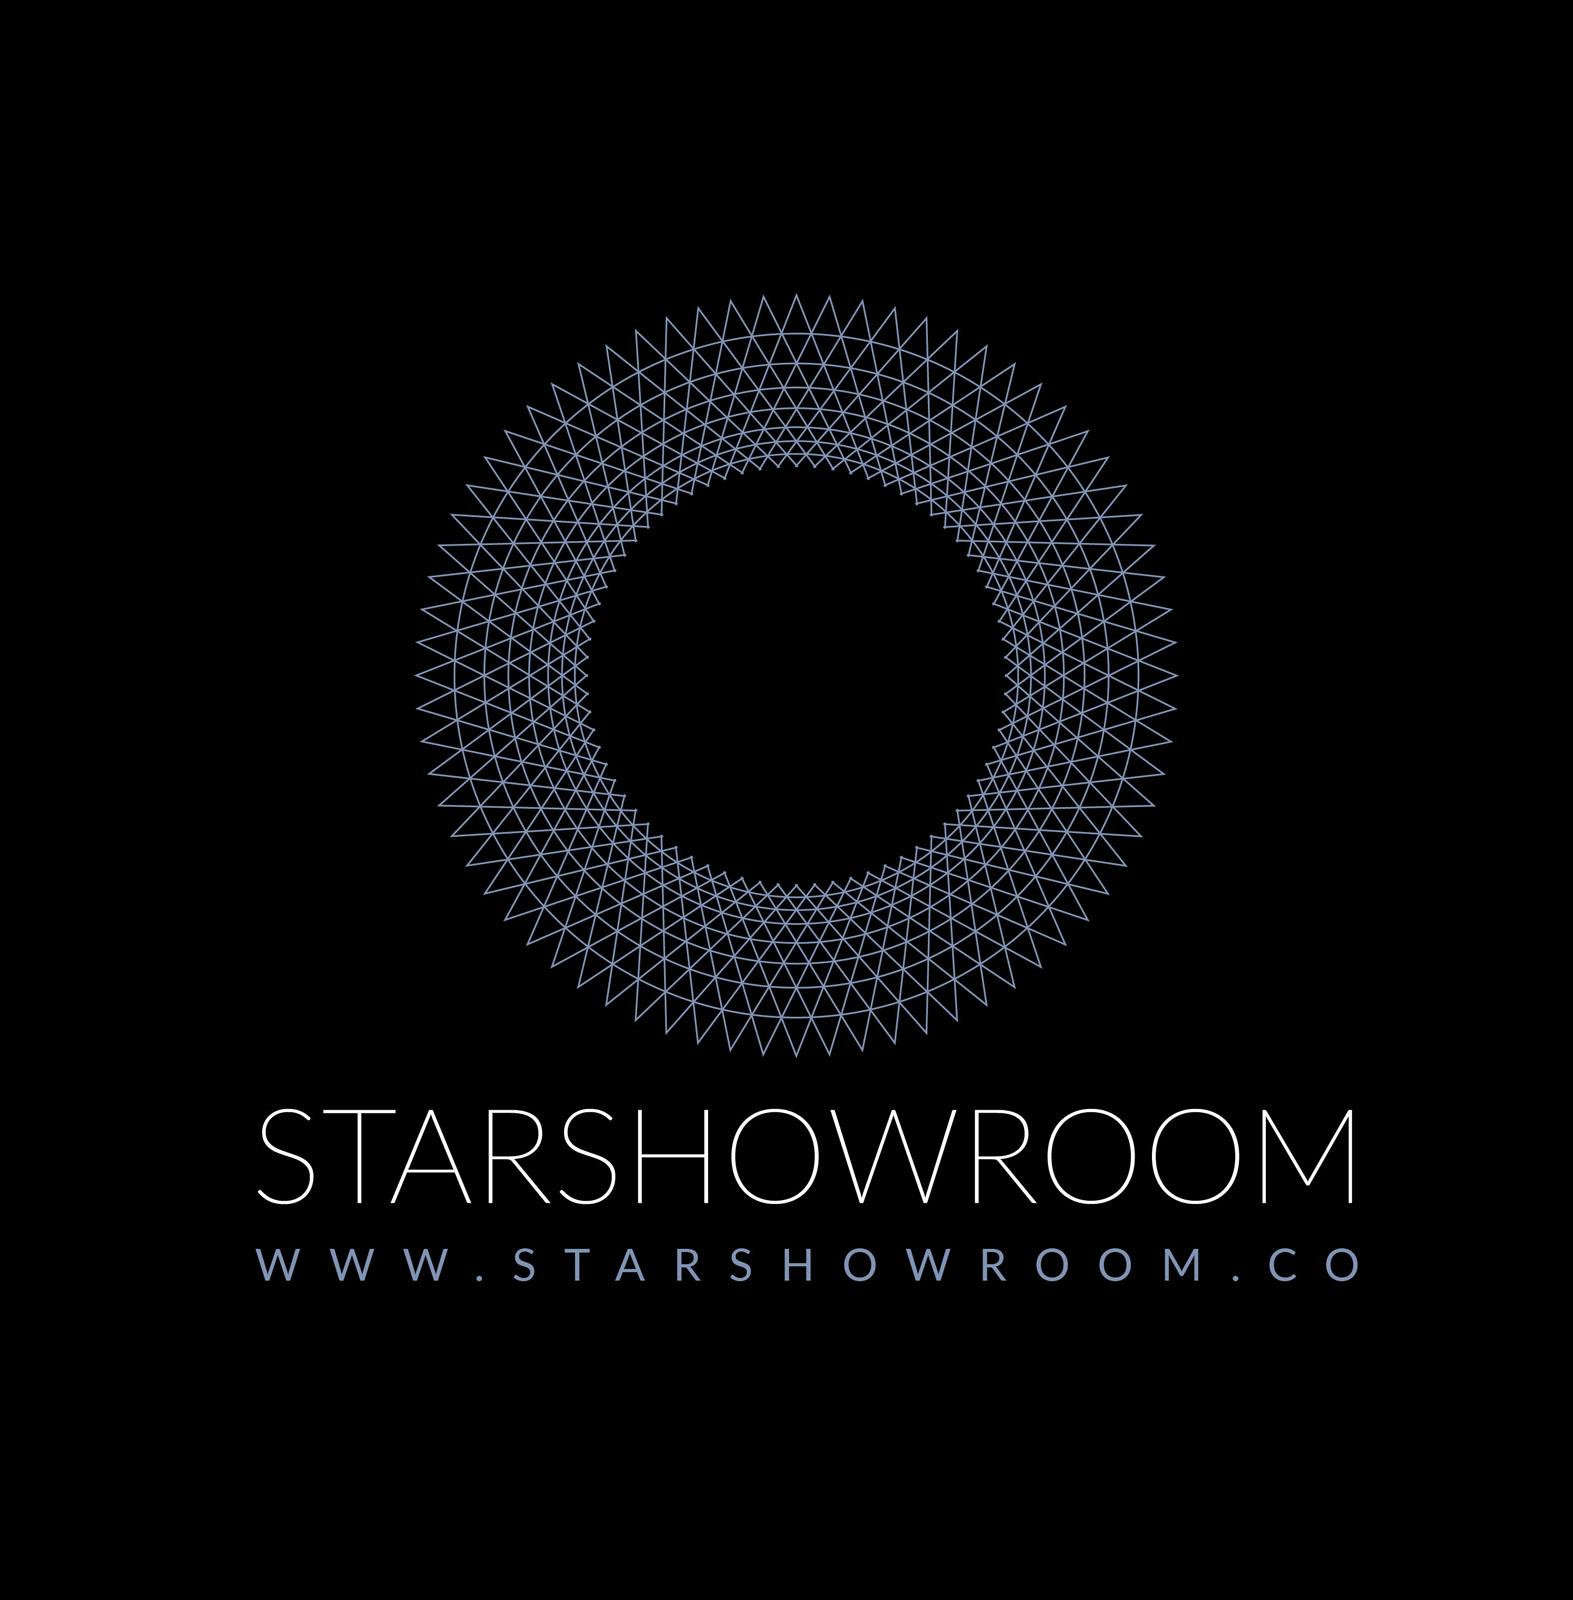 Star Showroom Dev Concept